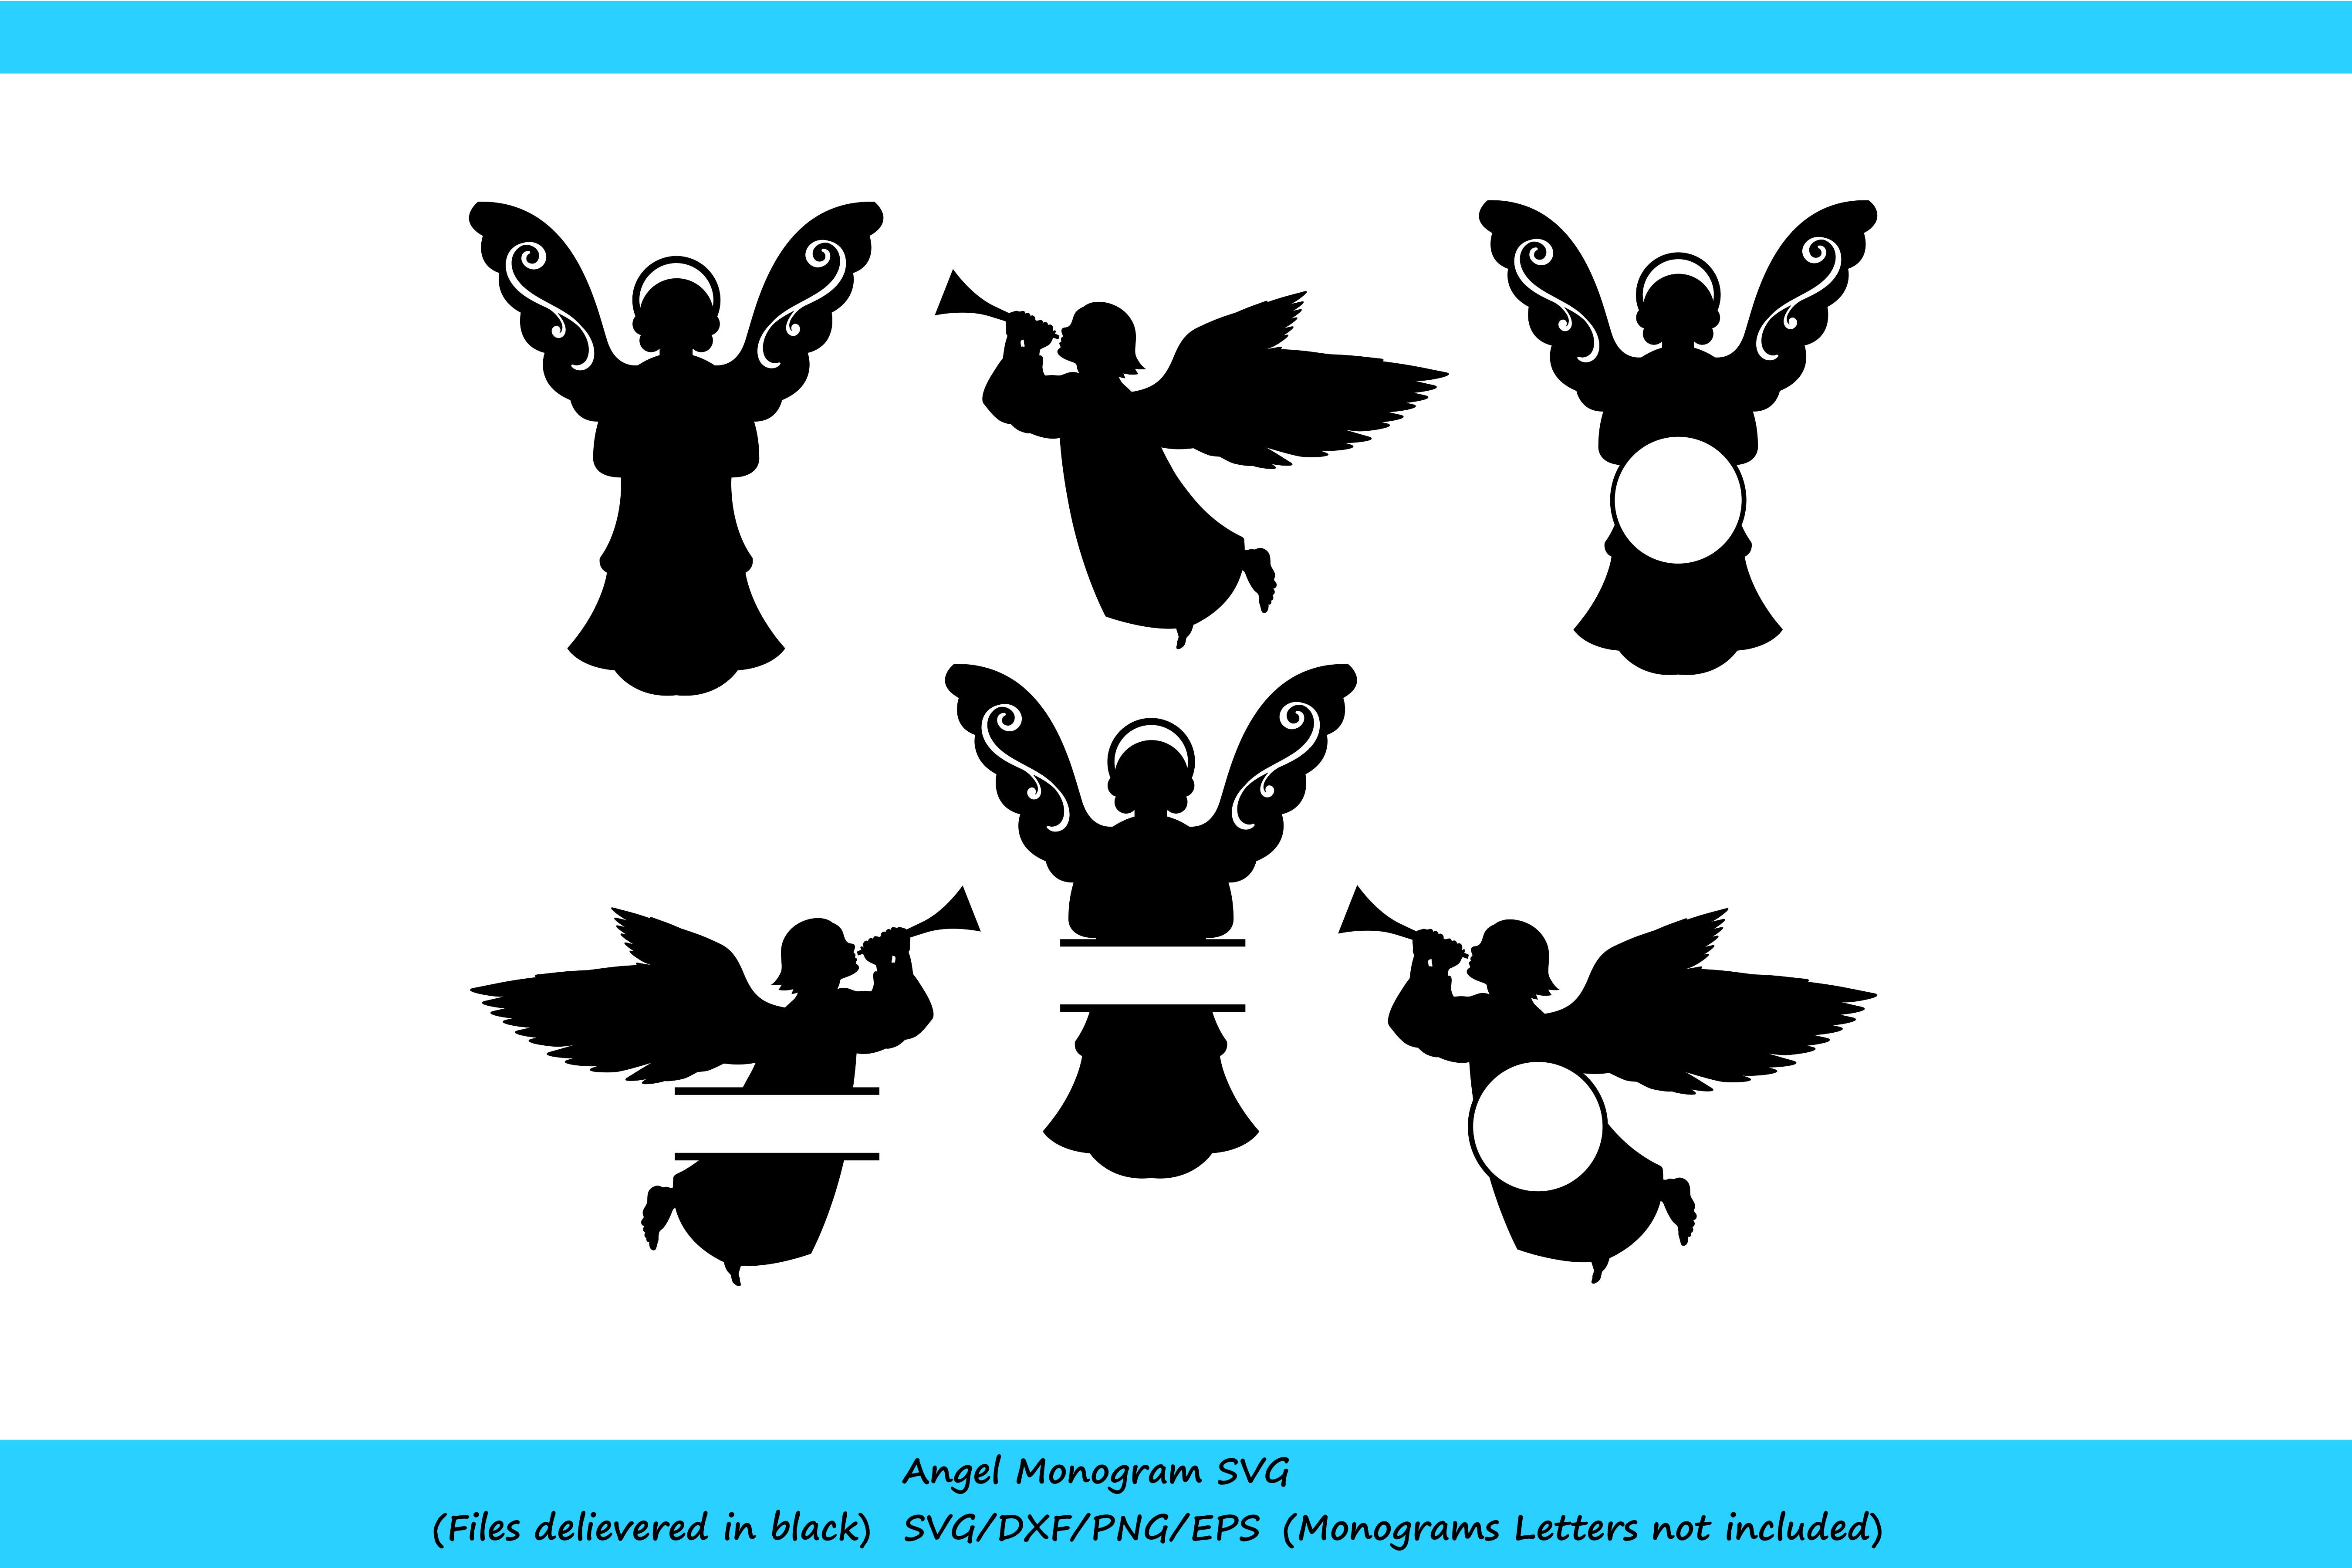 Angel SVG File   Silhouette Monogram Angels example image 2